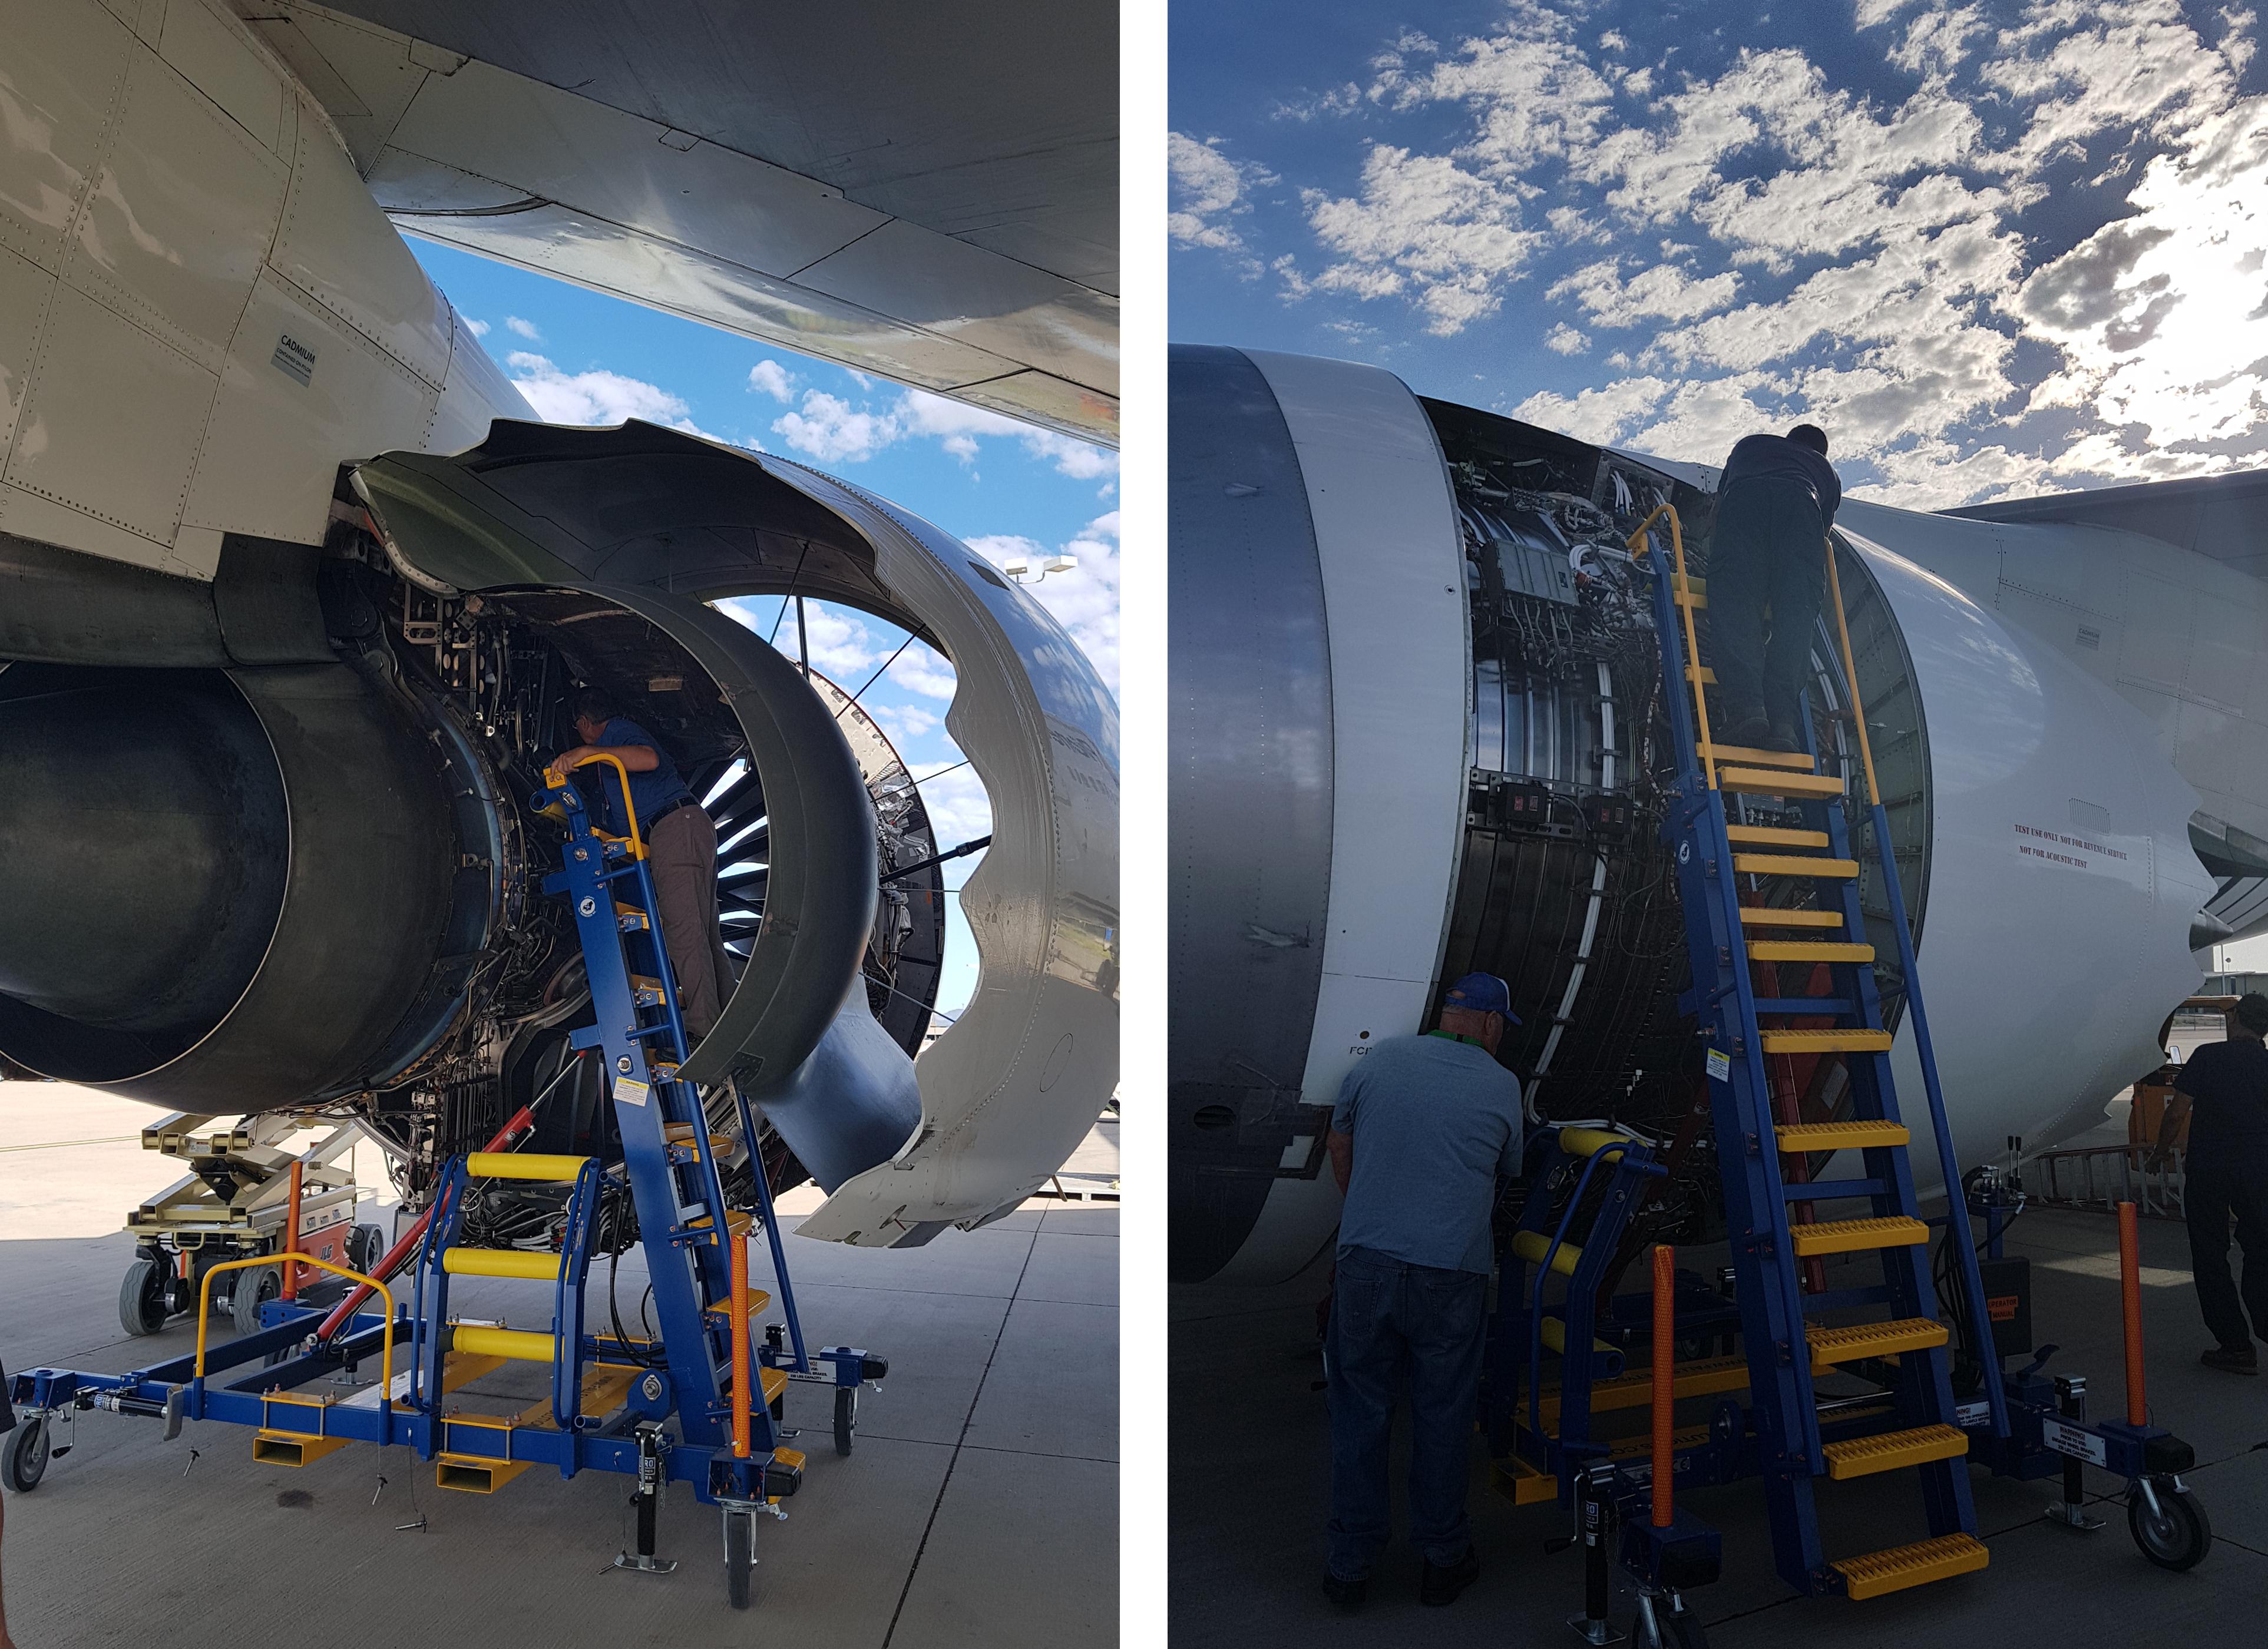 Aircraft Maintenance and Engine Access Stand 07-08 & IntelligentEngine